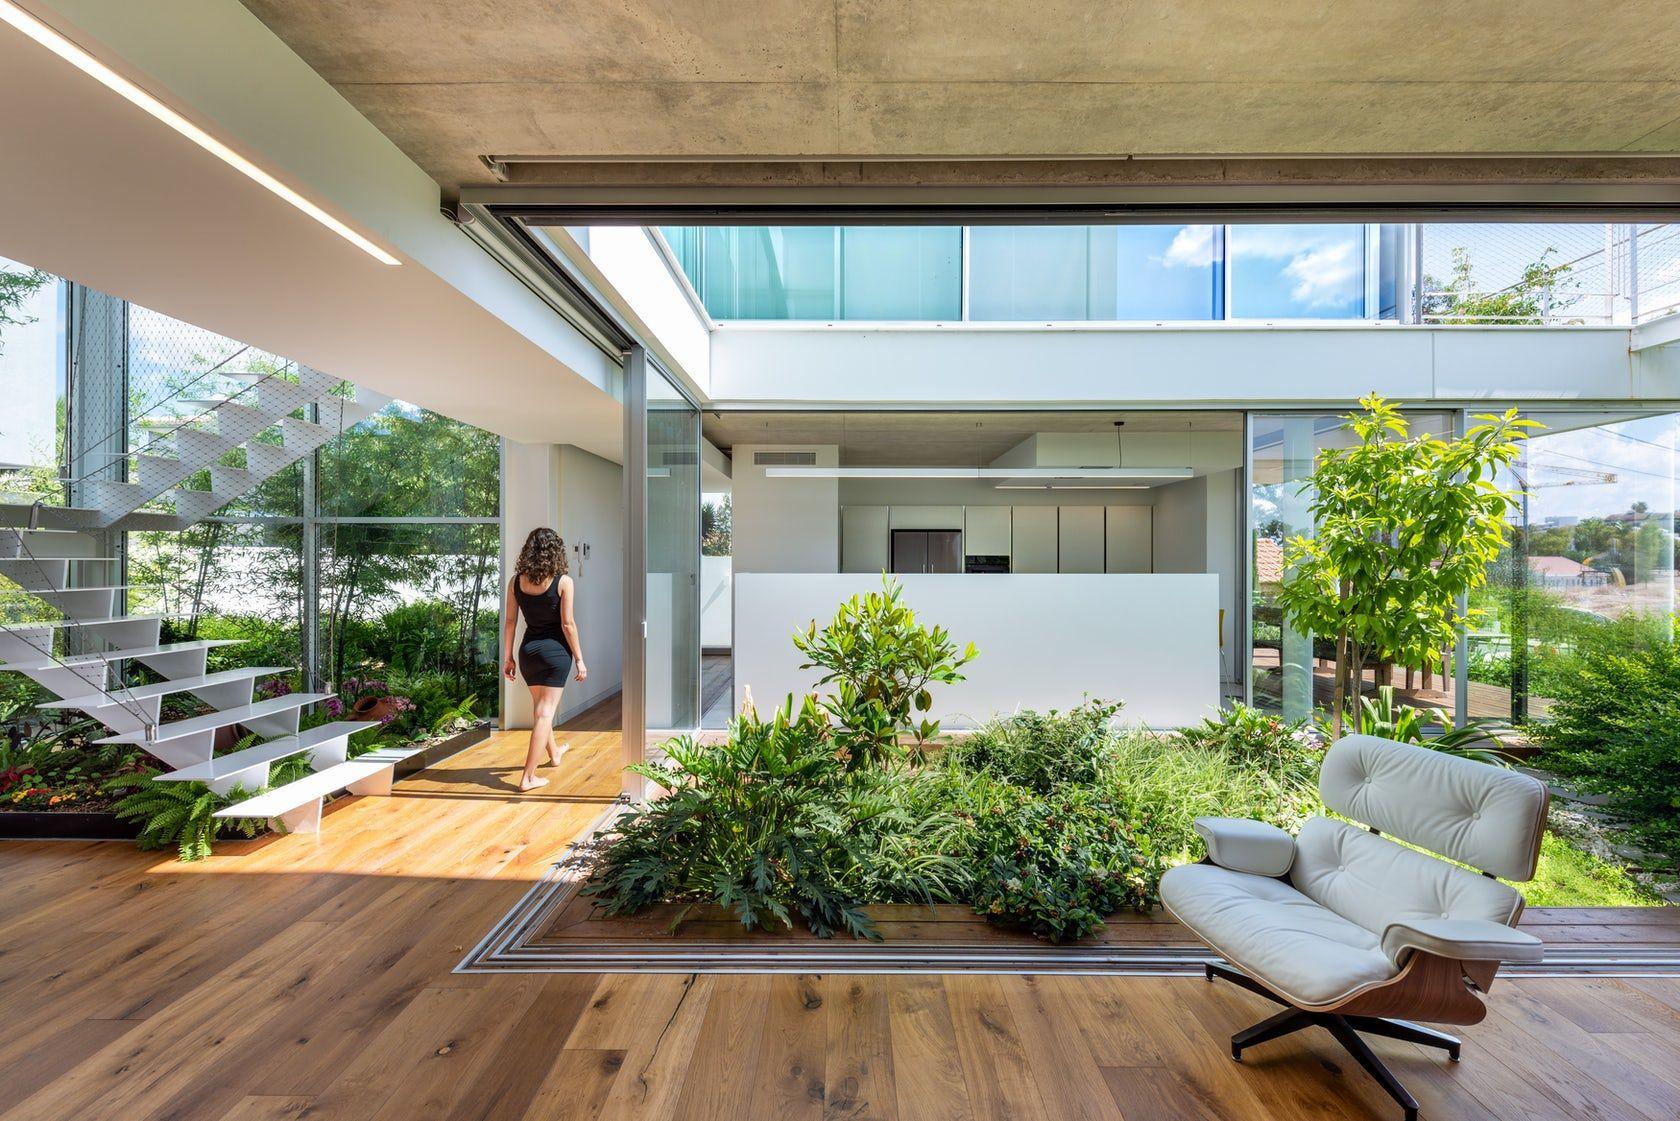 Idea 3065088 The Garden House In The City By Christos Pavlou Architecture In Nicosia Cyprus In 2020 Interior Garden Architecture Green Terrace